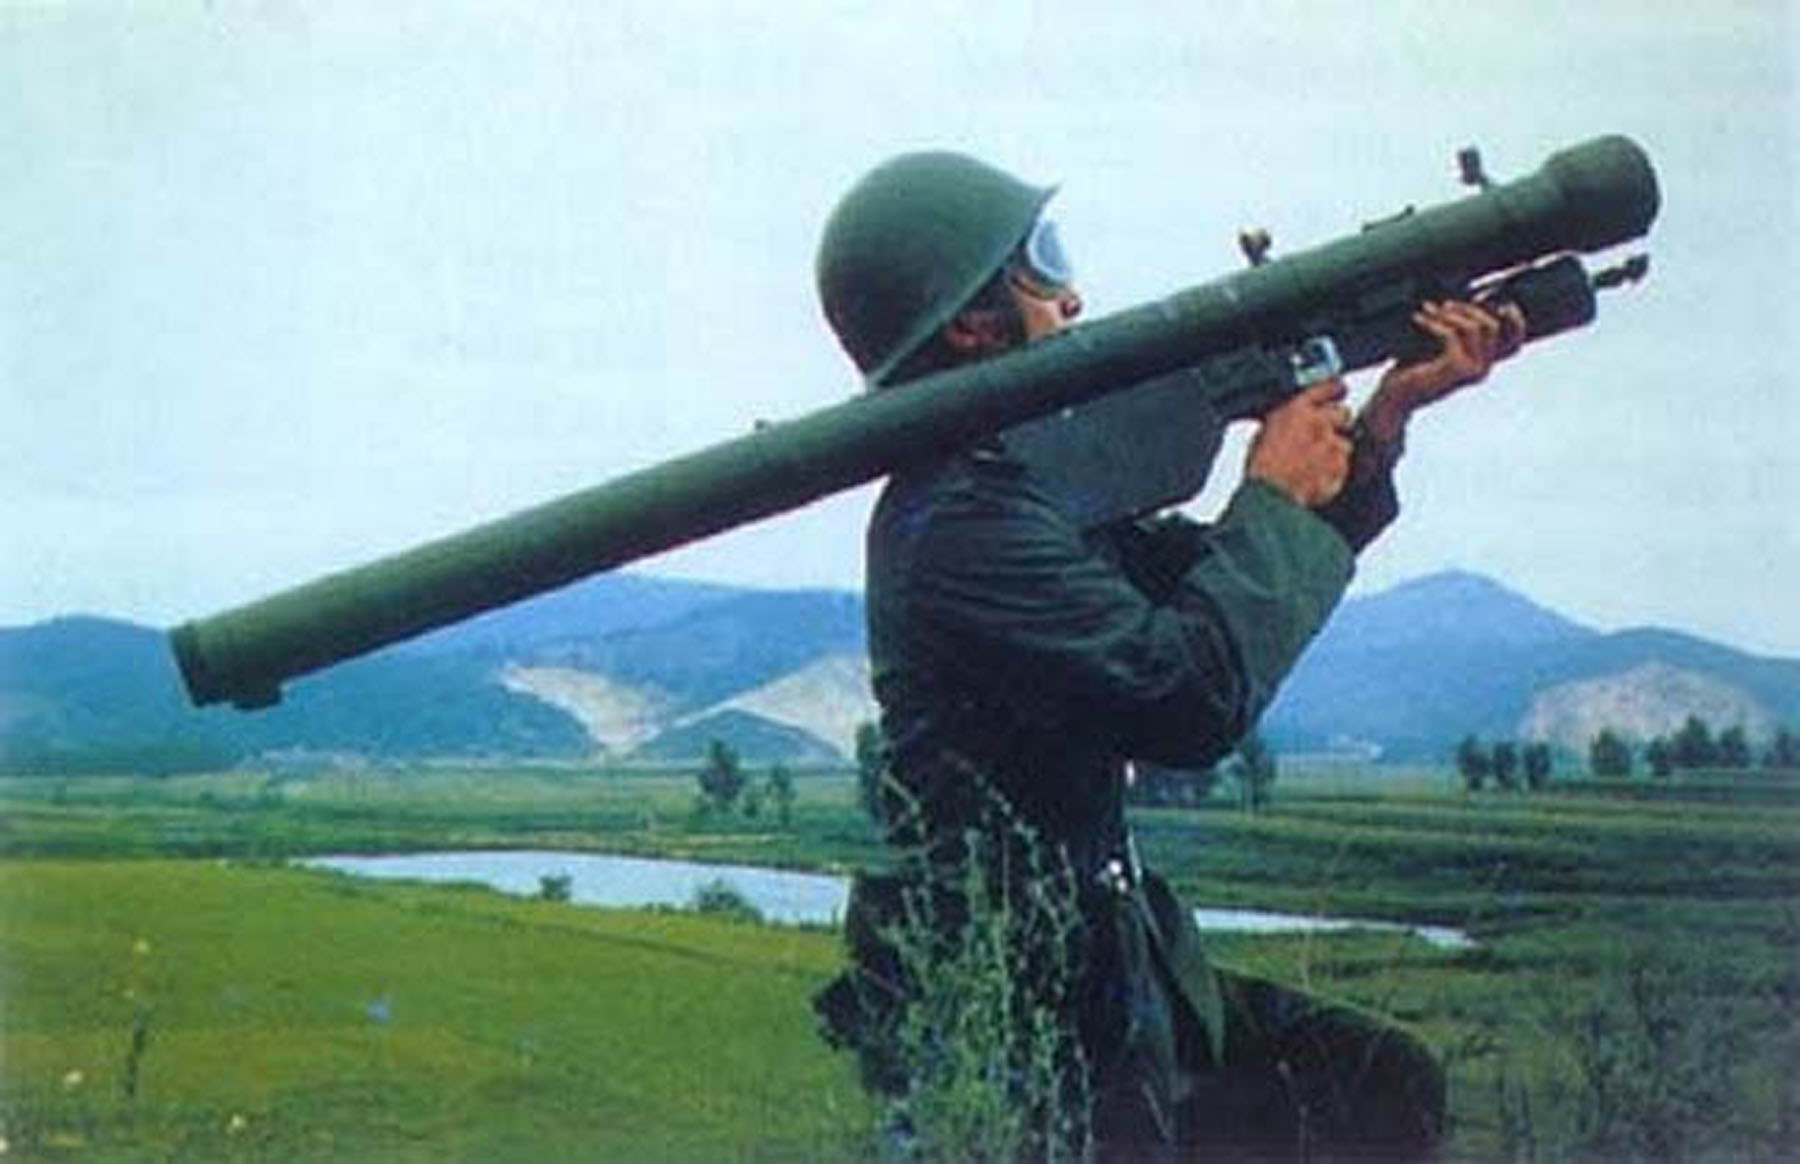 Lako prijenosni raketni sustav protuzračne obrane 9K32 Strela-2